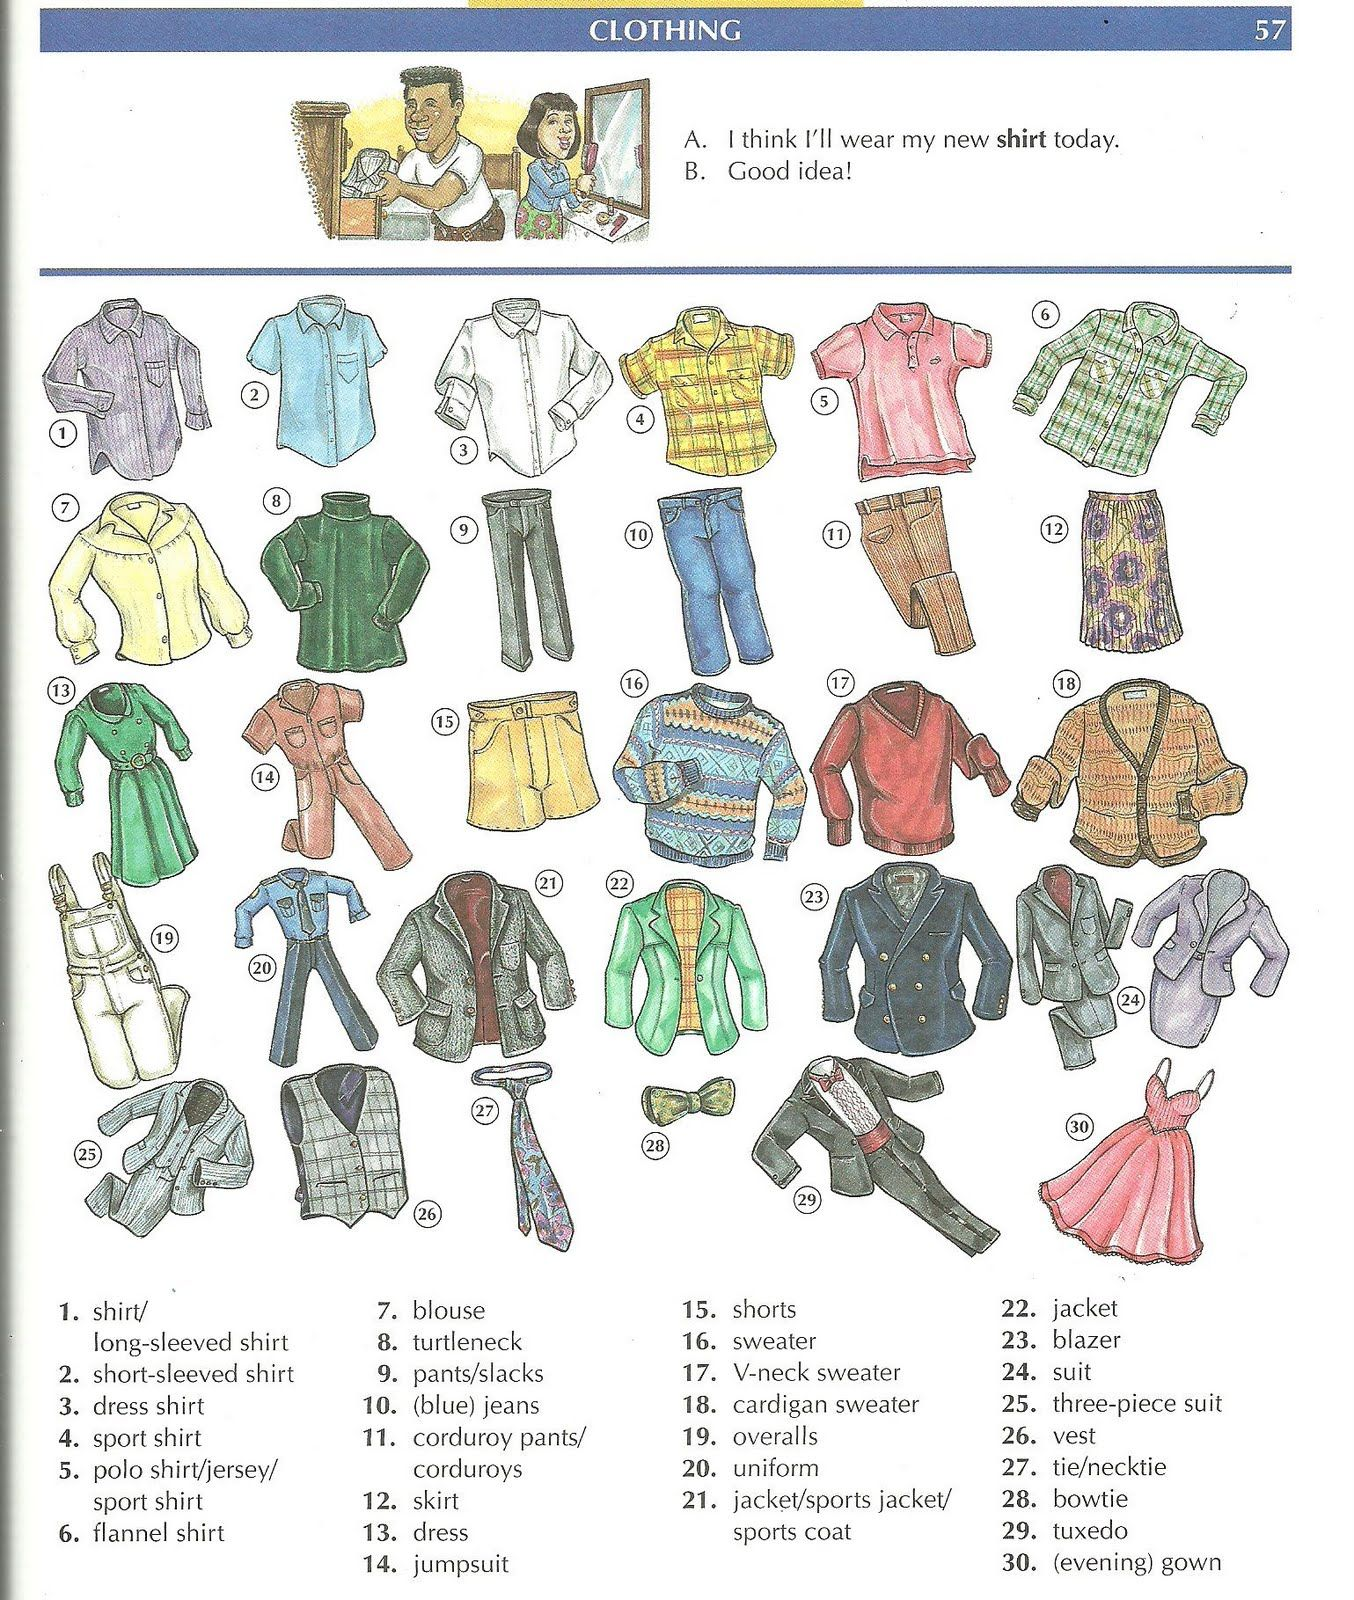 Clothing Vocab Vocabulary Clothes Vocabulary Pictures English